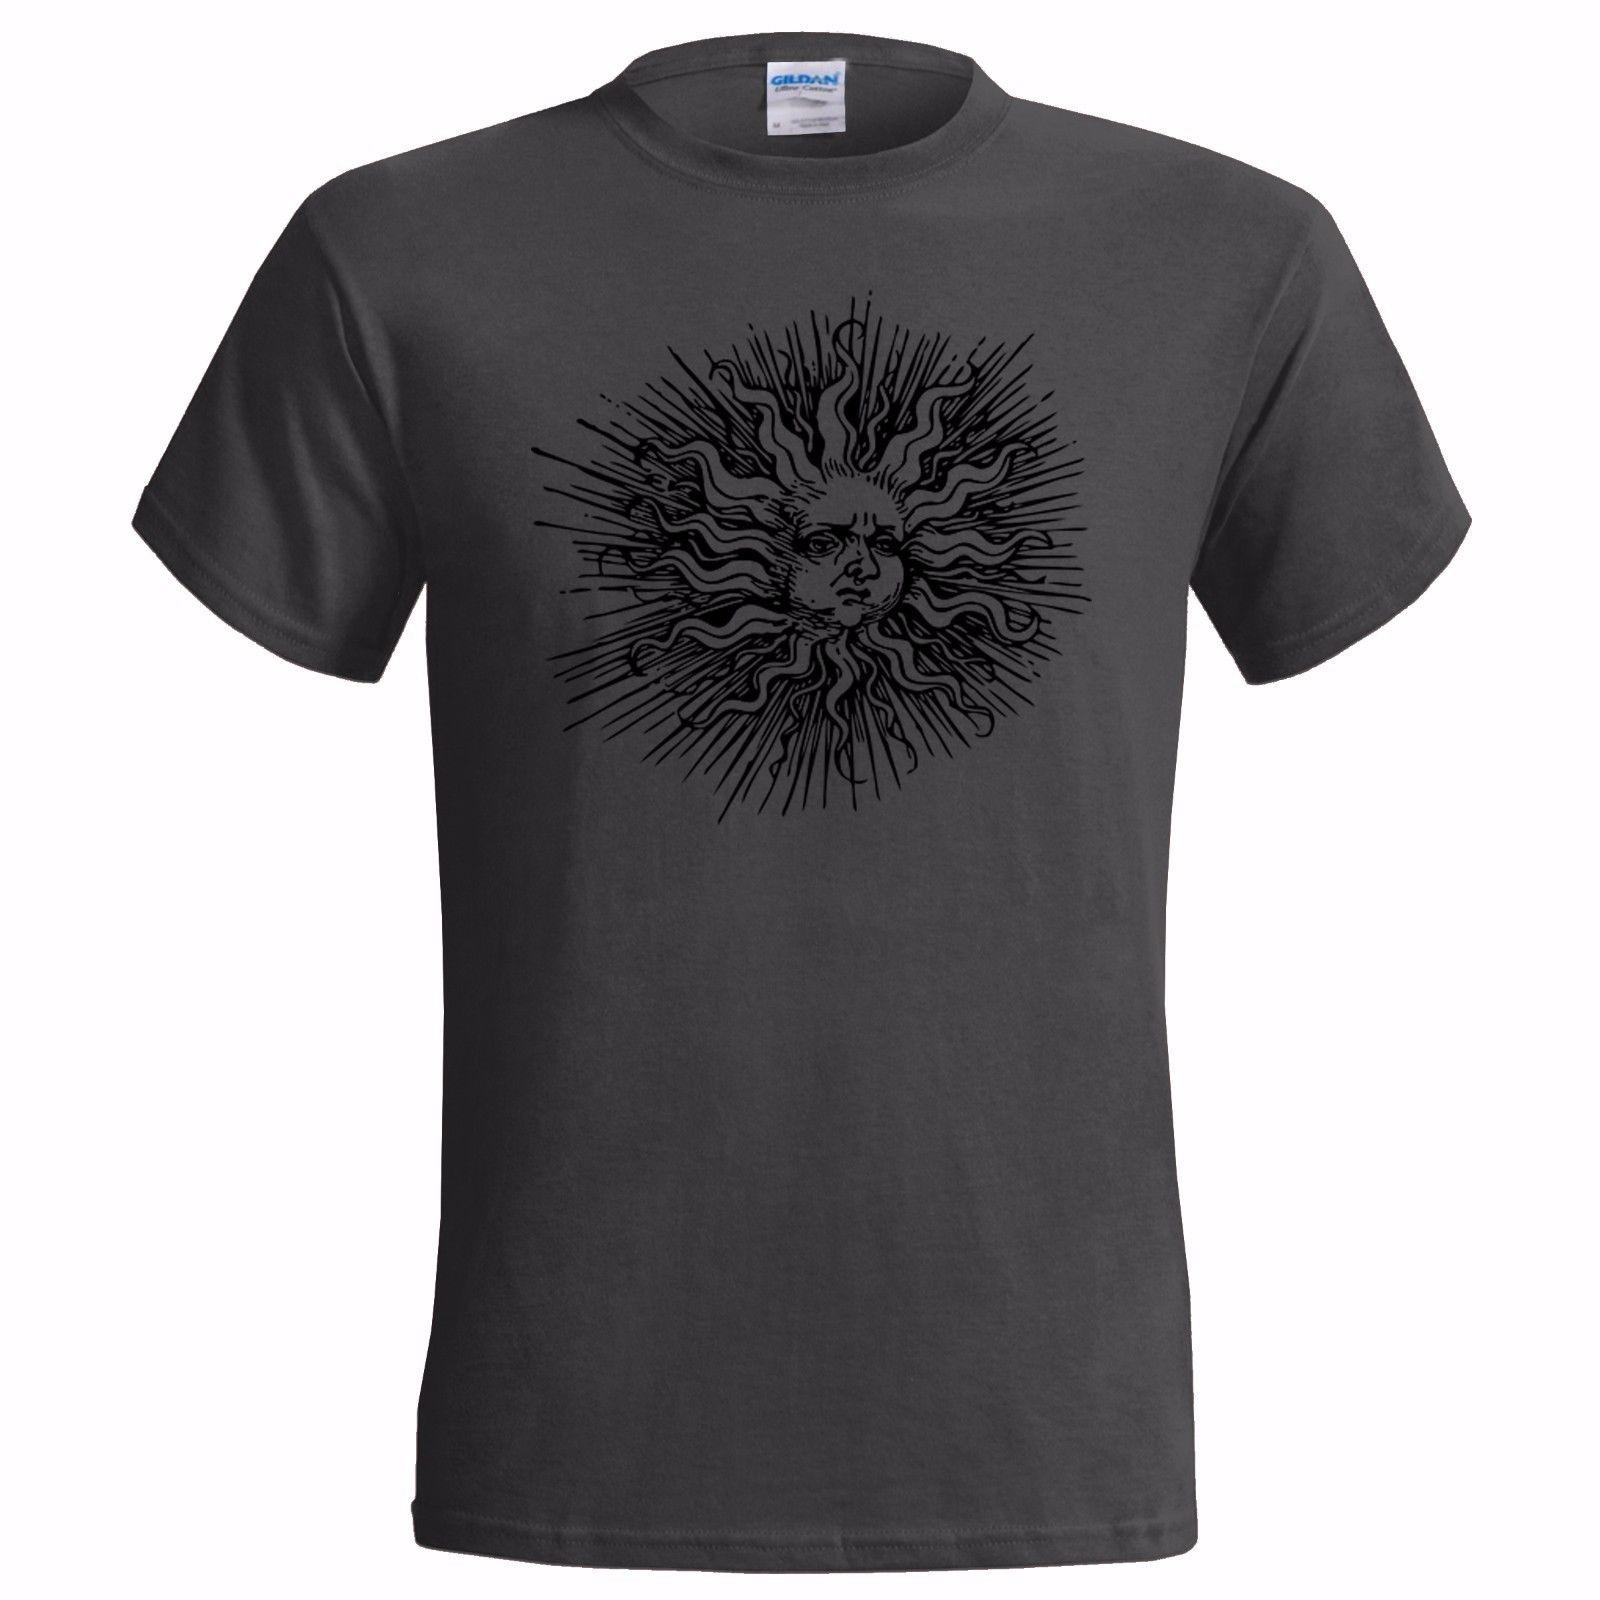 SUMMER SOLSTICE ART MENS T SHIRT PAGAN HIPPY URBAN DRUID EQUINOX WICCA RELIGION Summer Short Sleeves Cotton T-Shirt Black Style